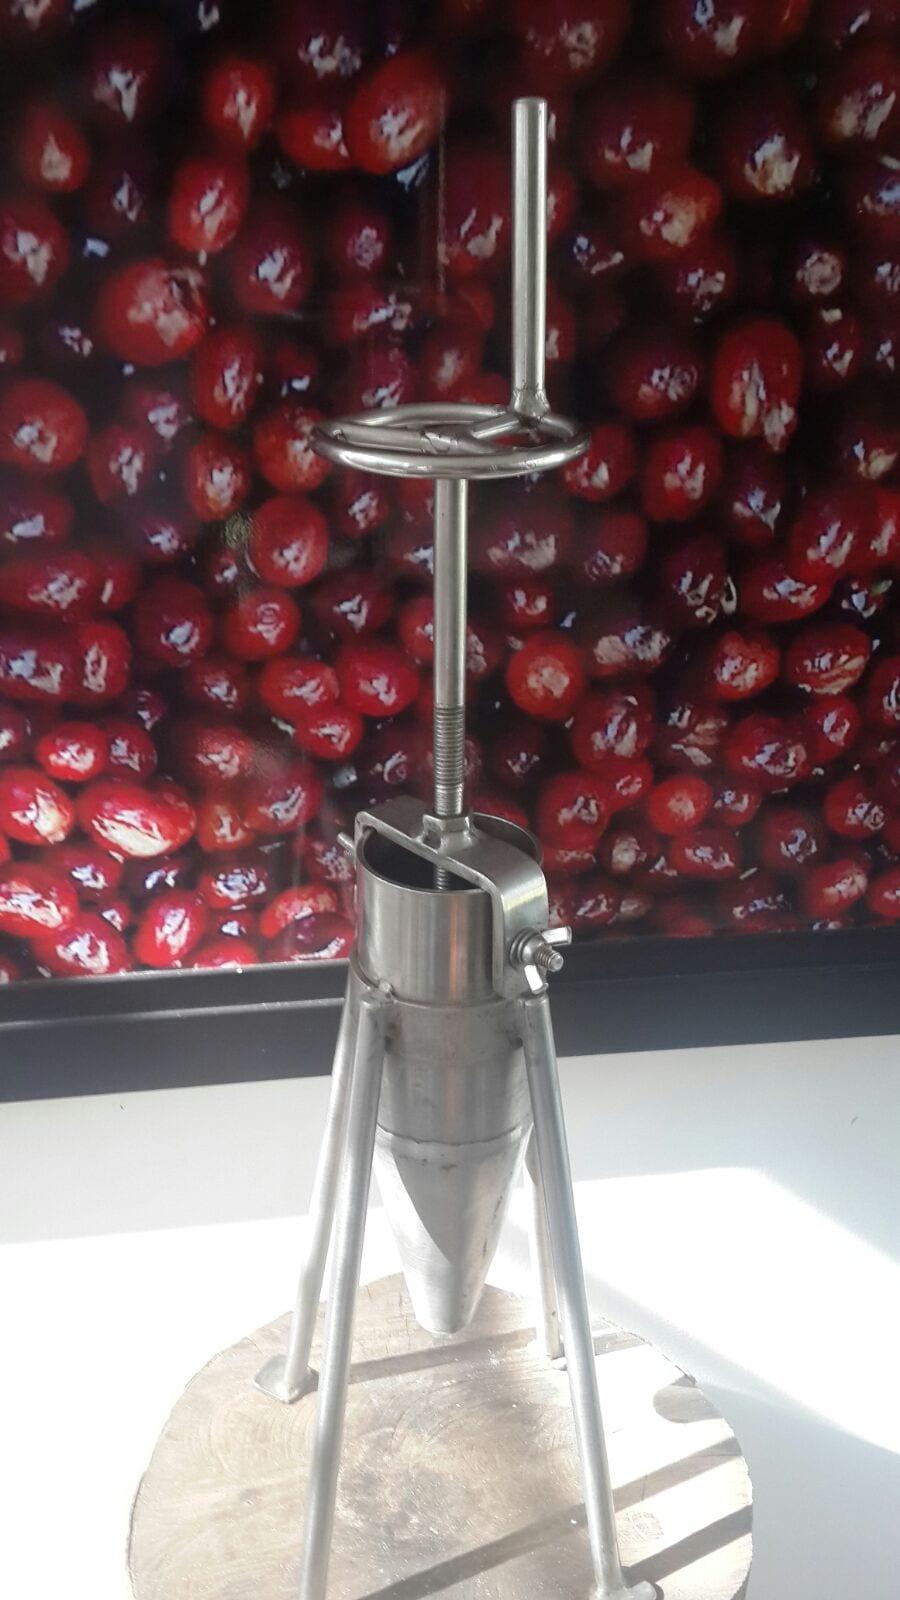 honeysucker coffee press